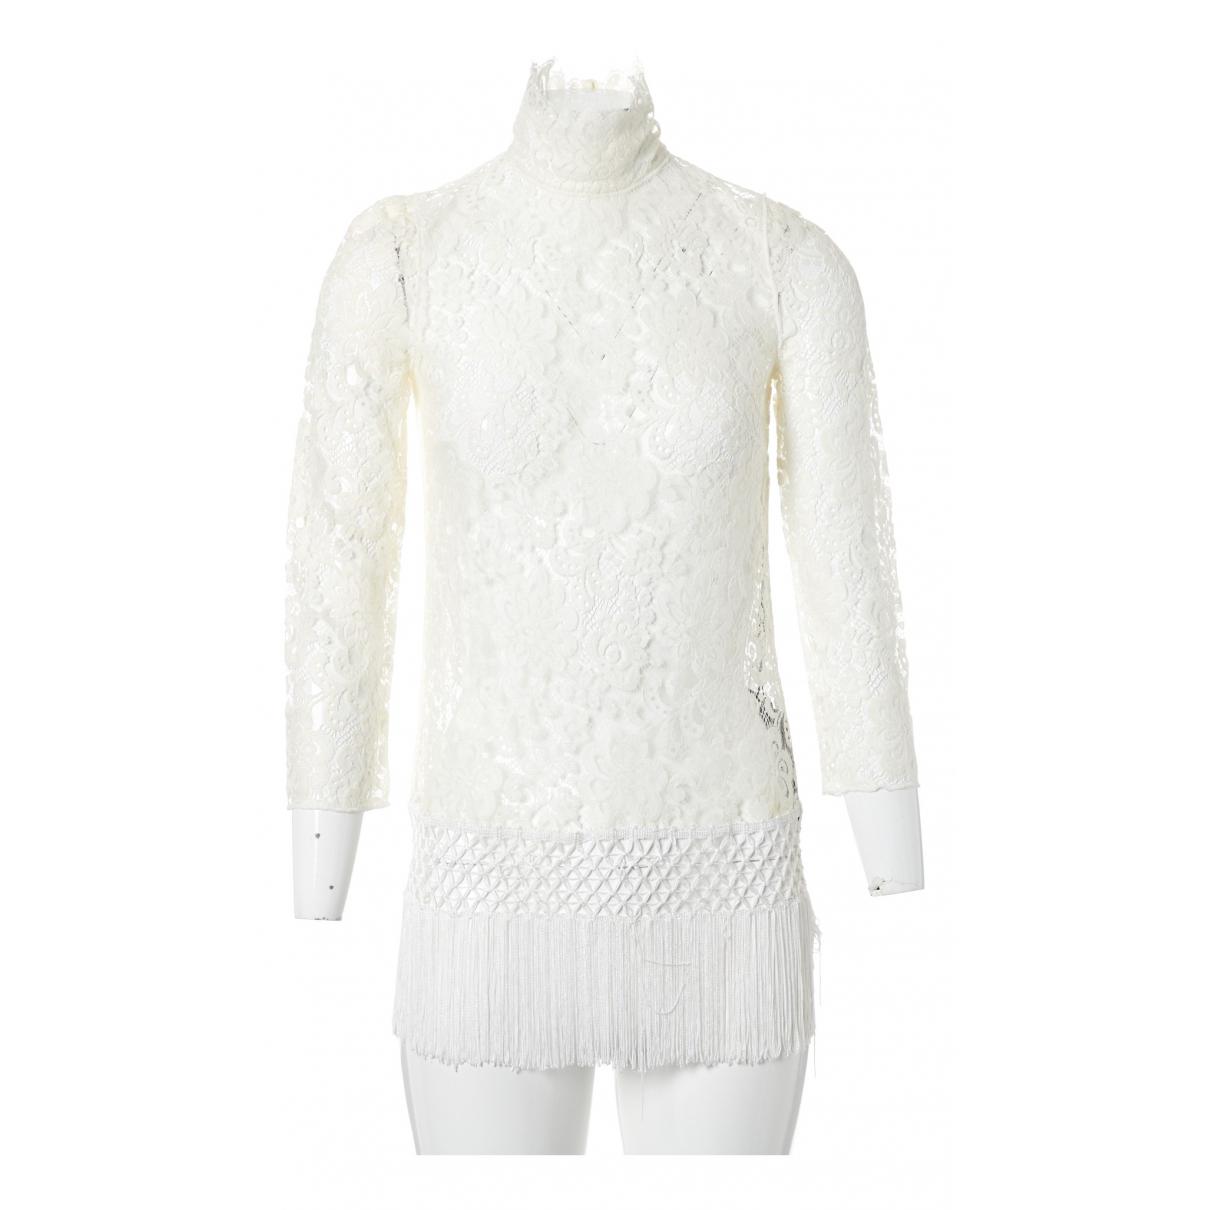 Dolce & Gabbana - Top   pour femme - ecru